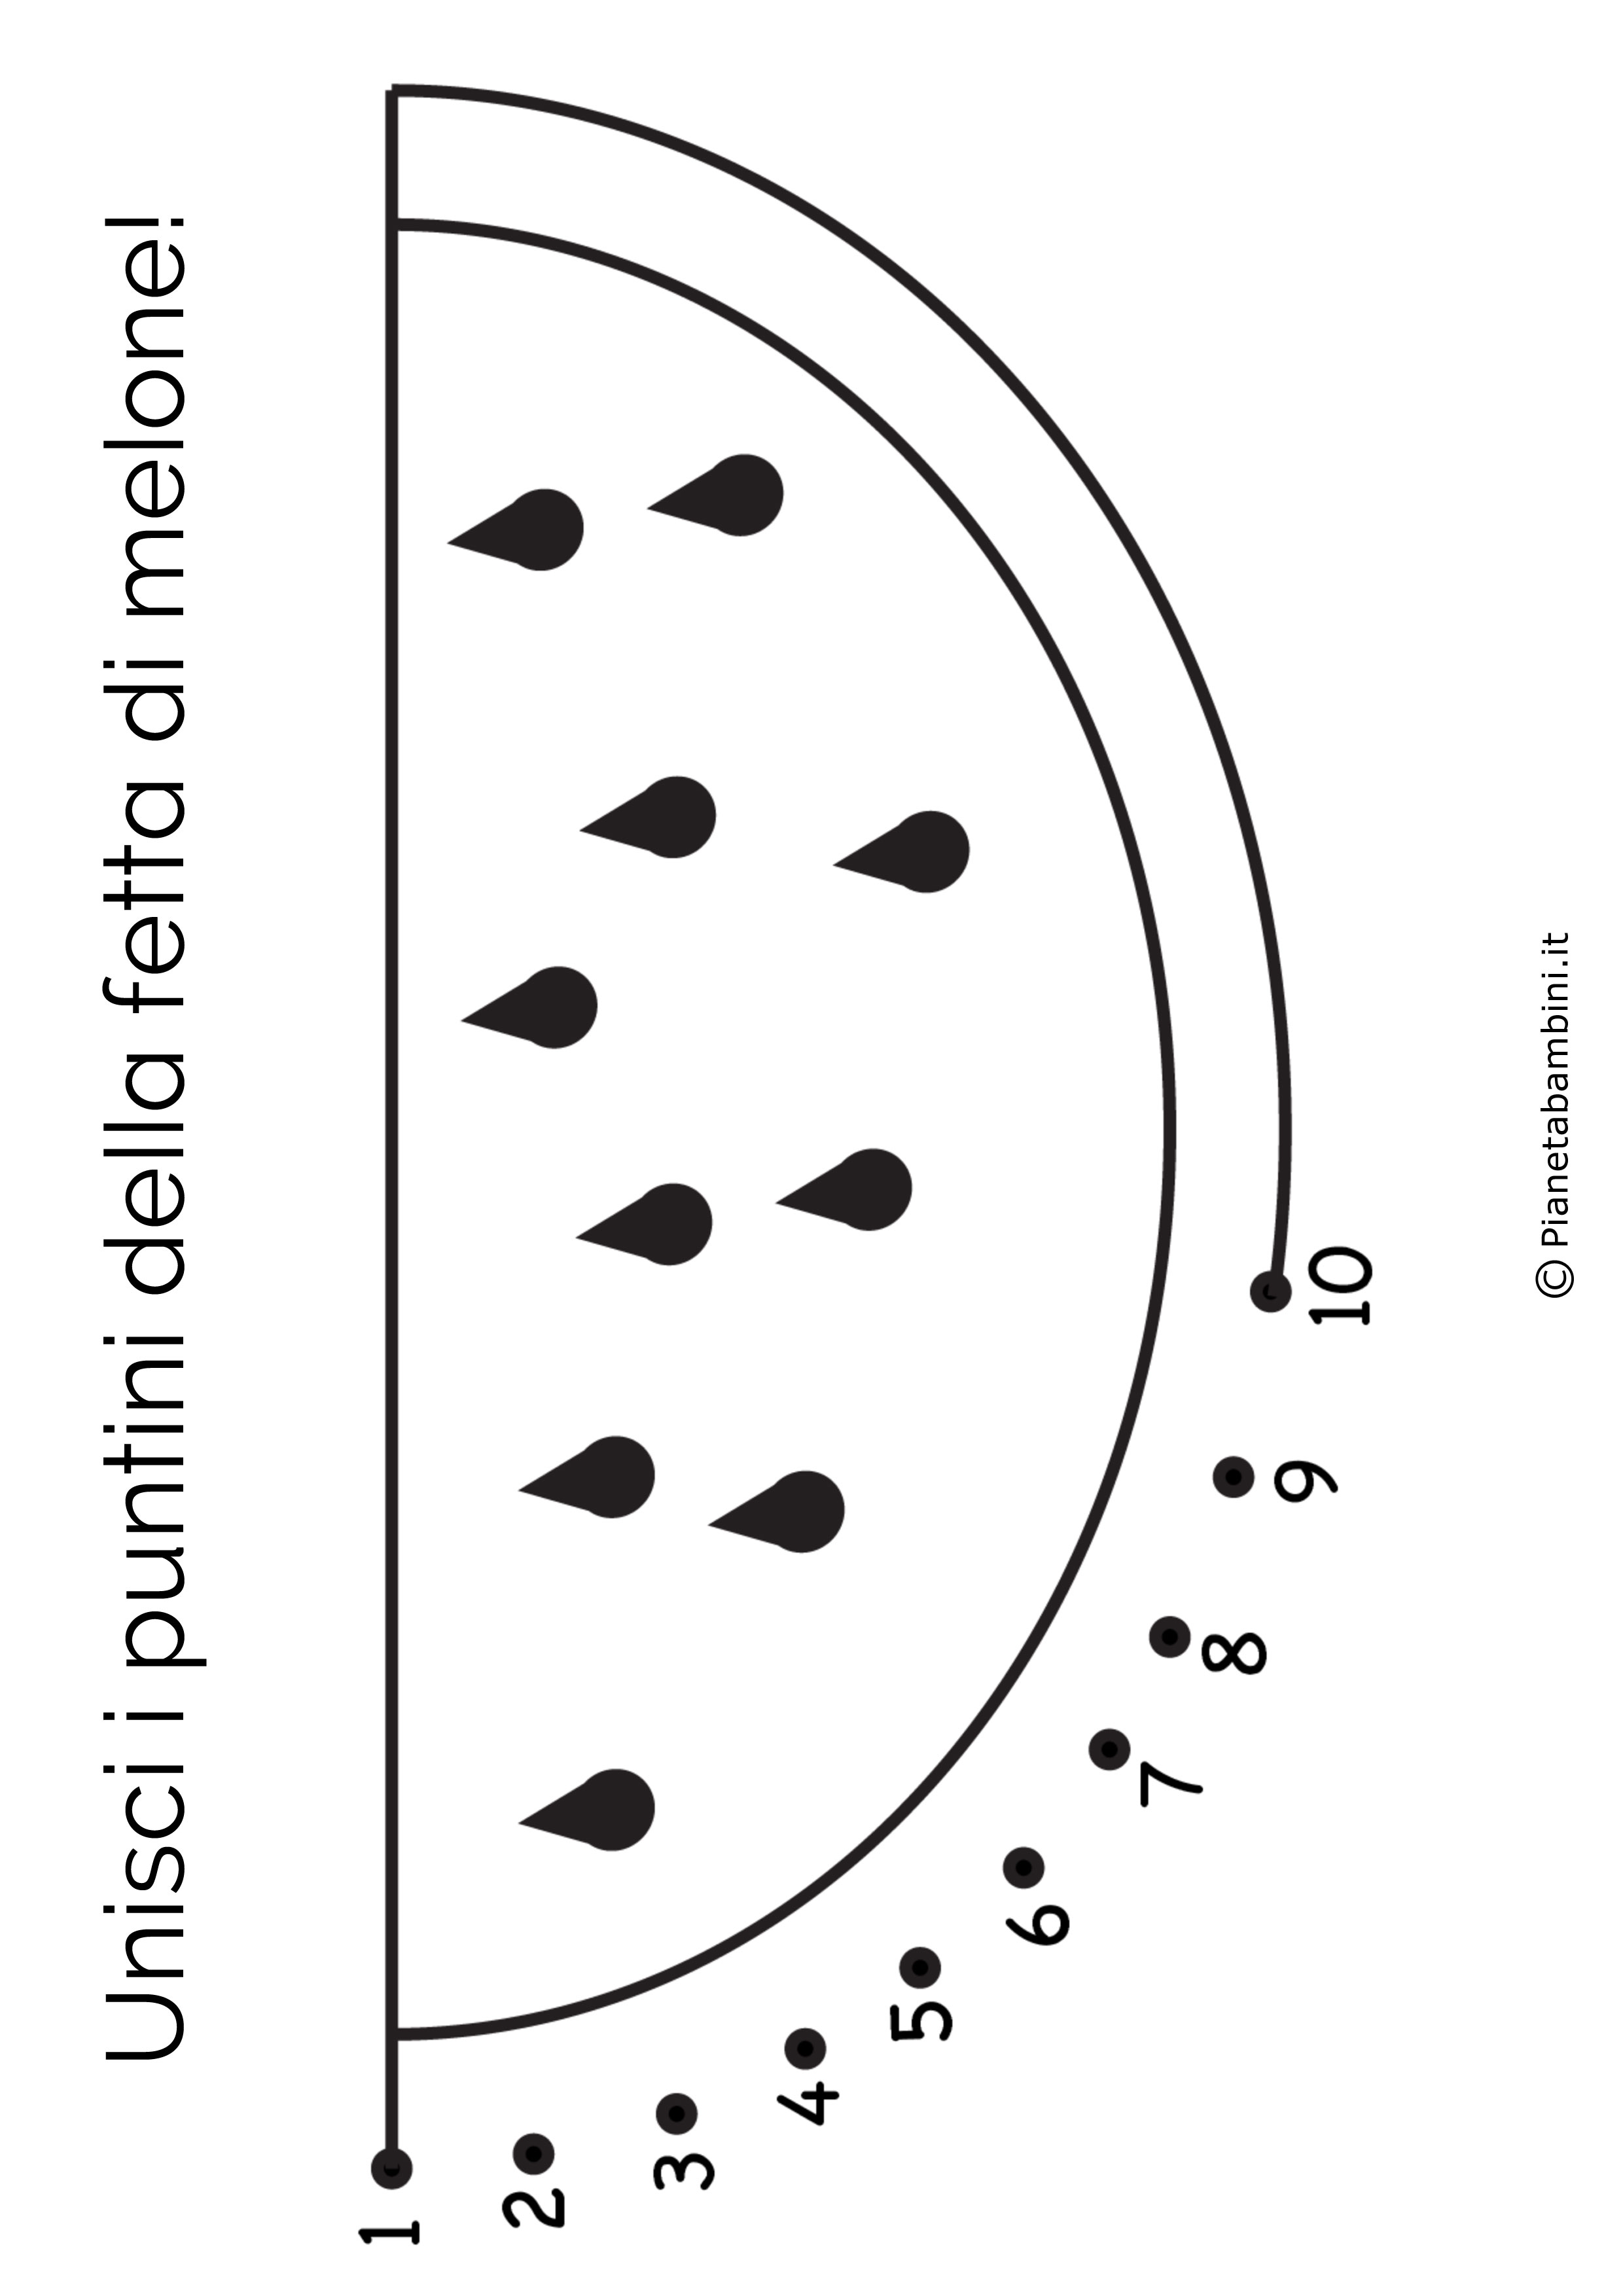 Disegno unisci i puntini melone